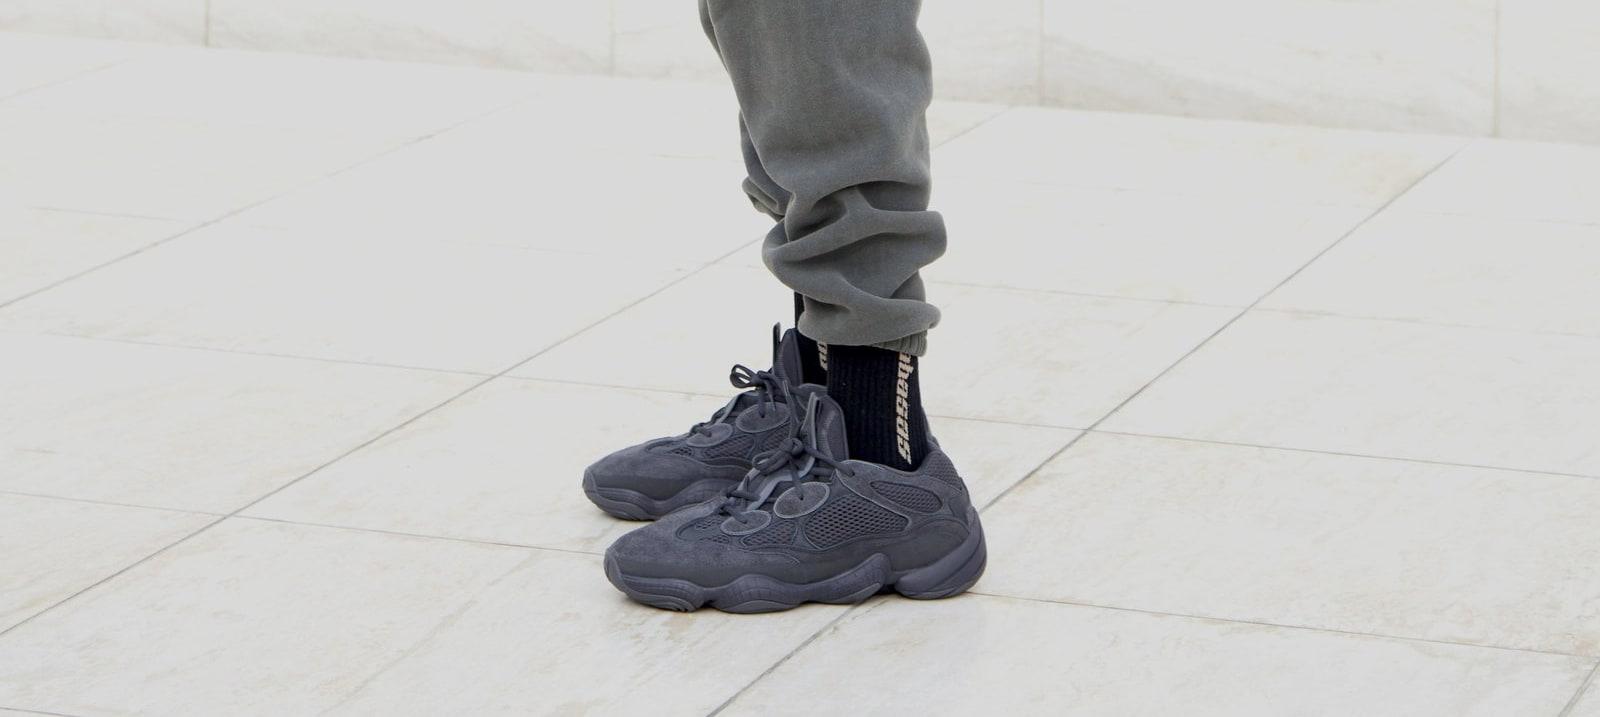 Adidas Yeezy 500 'Black' (On-Foot Left)